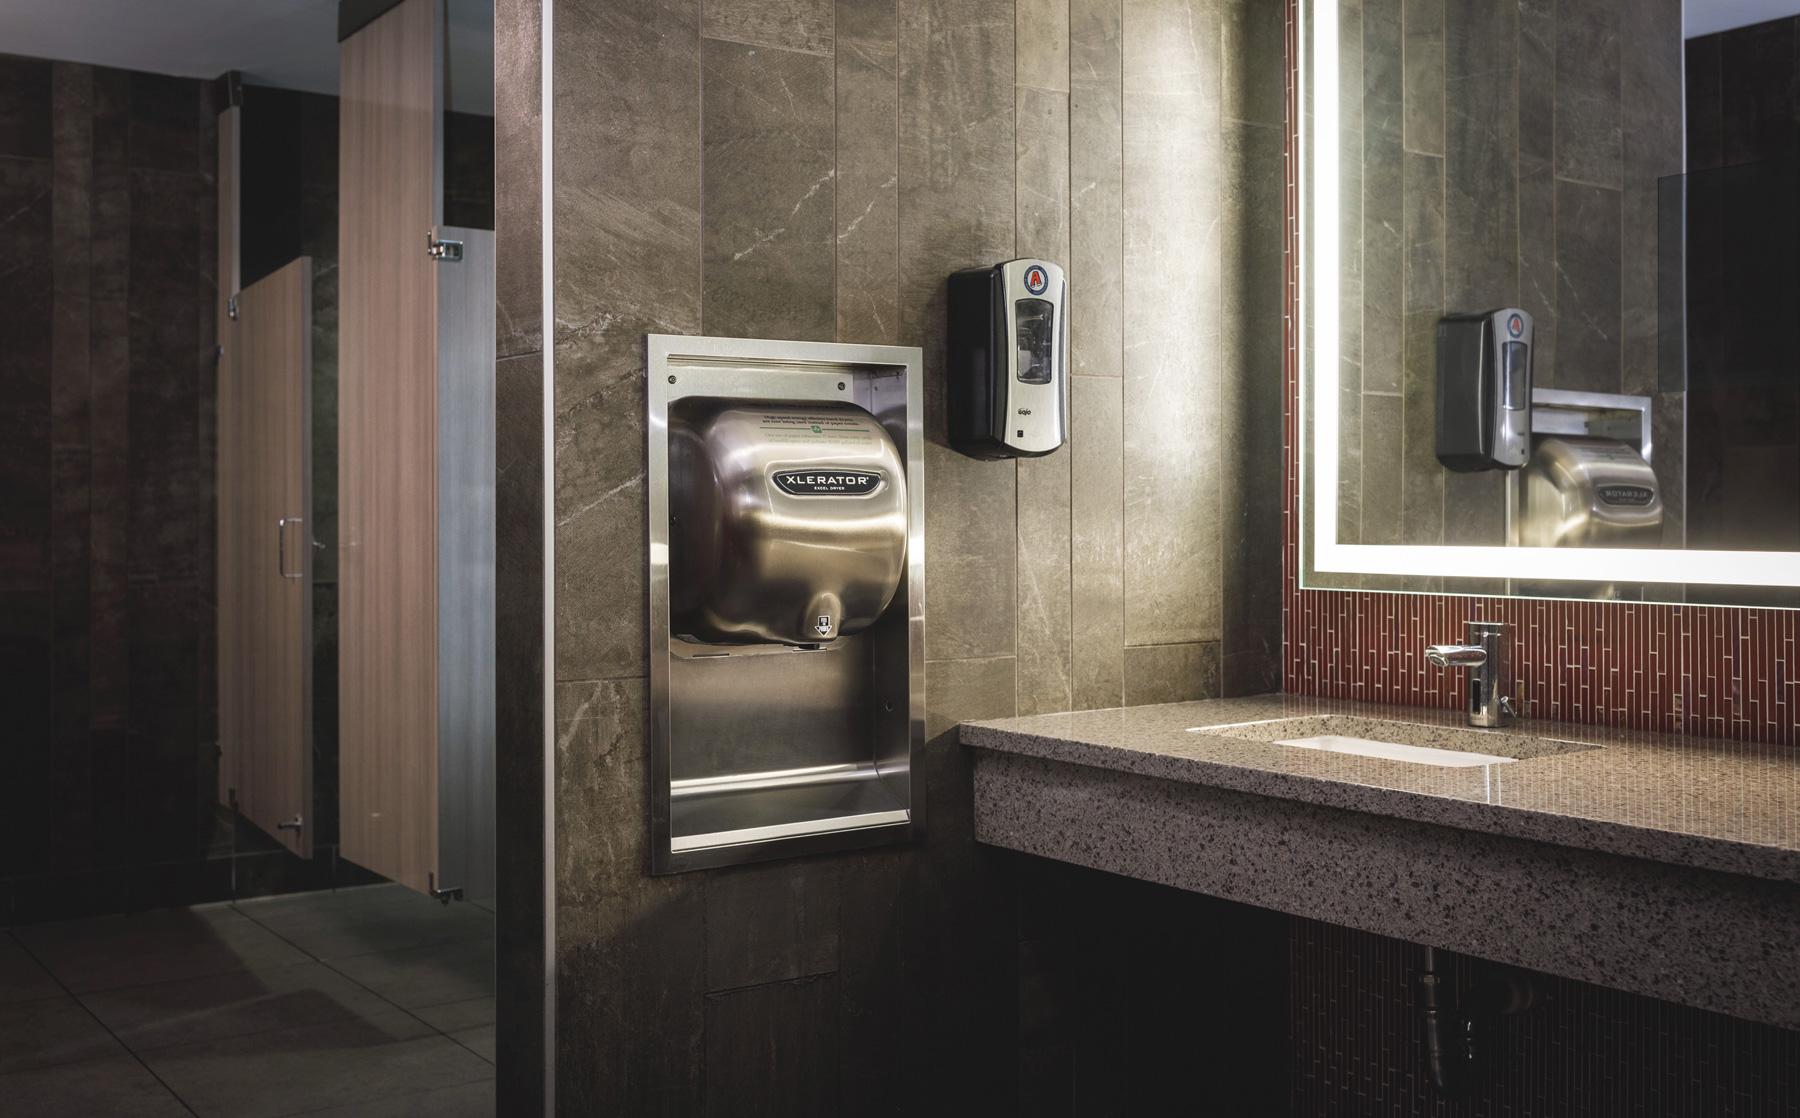 Xlerator 174 Hand Dryer 8 Second Dry Time